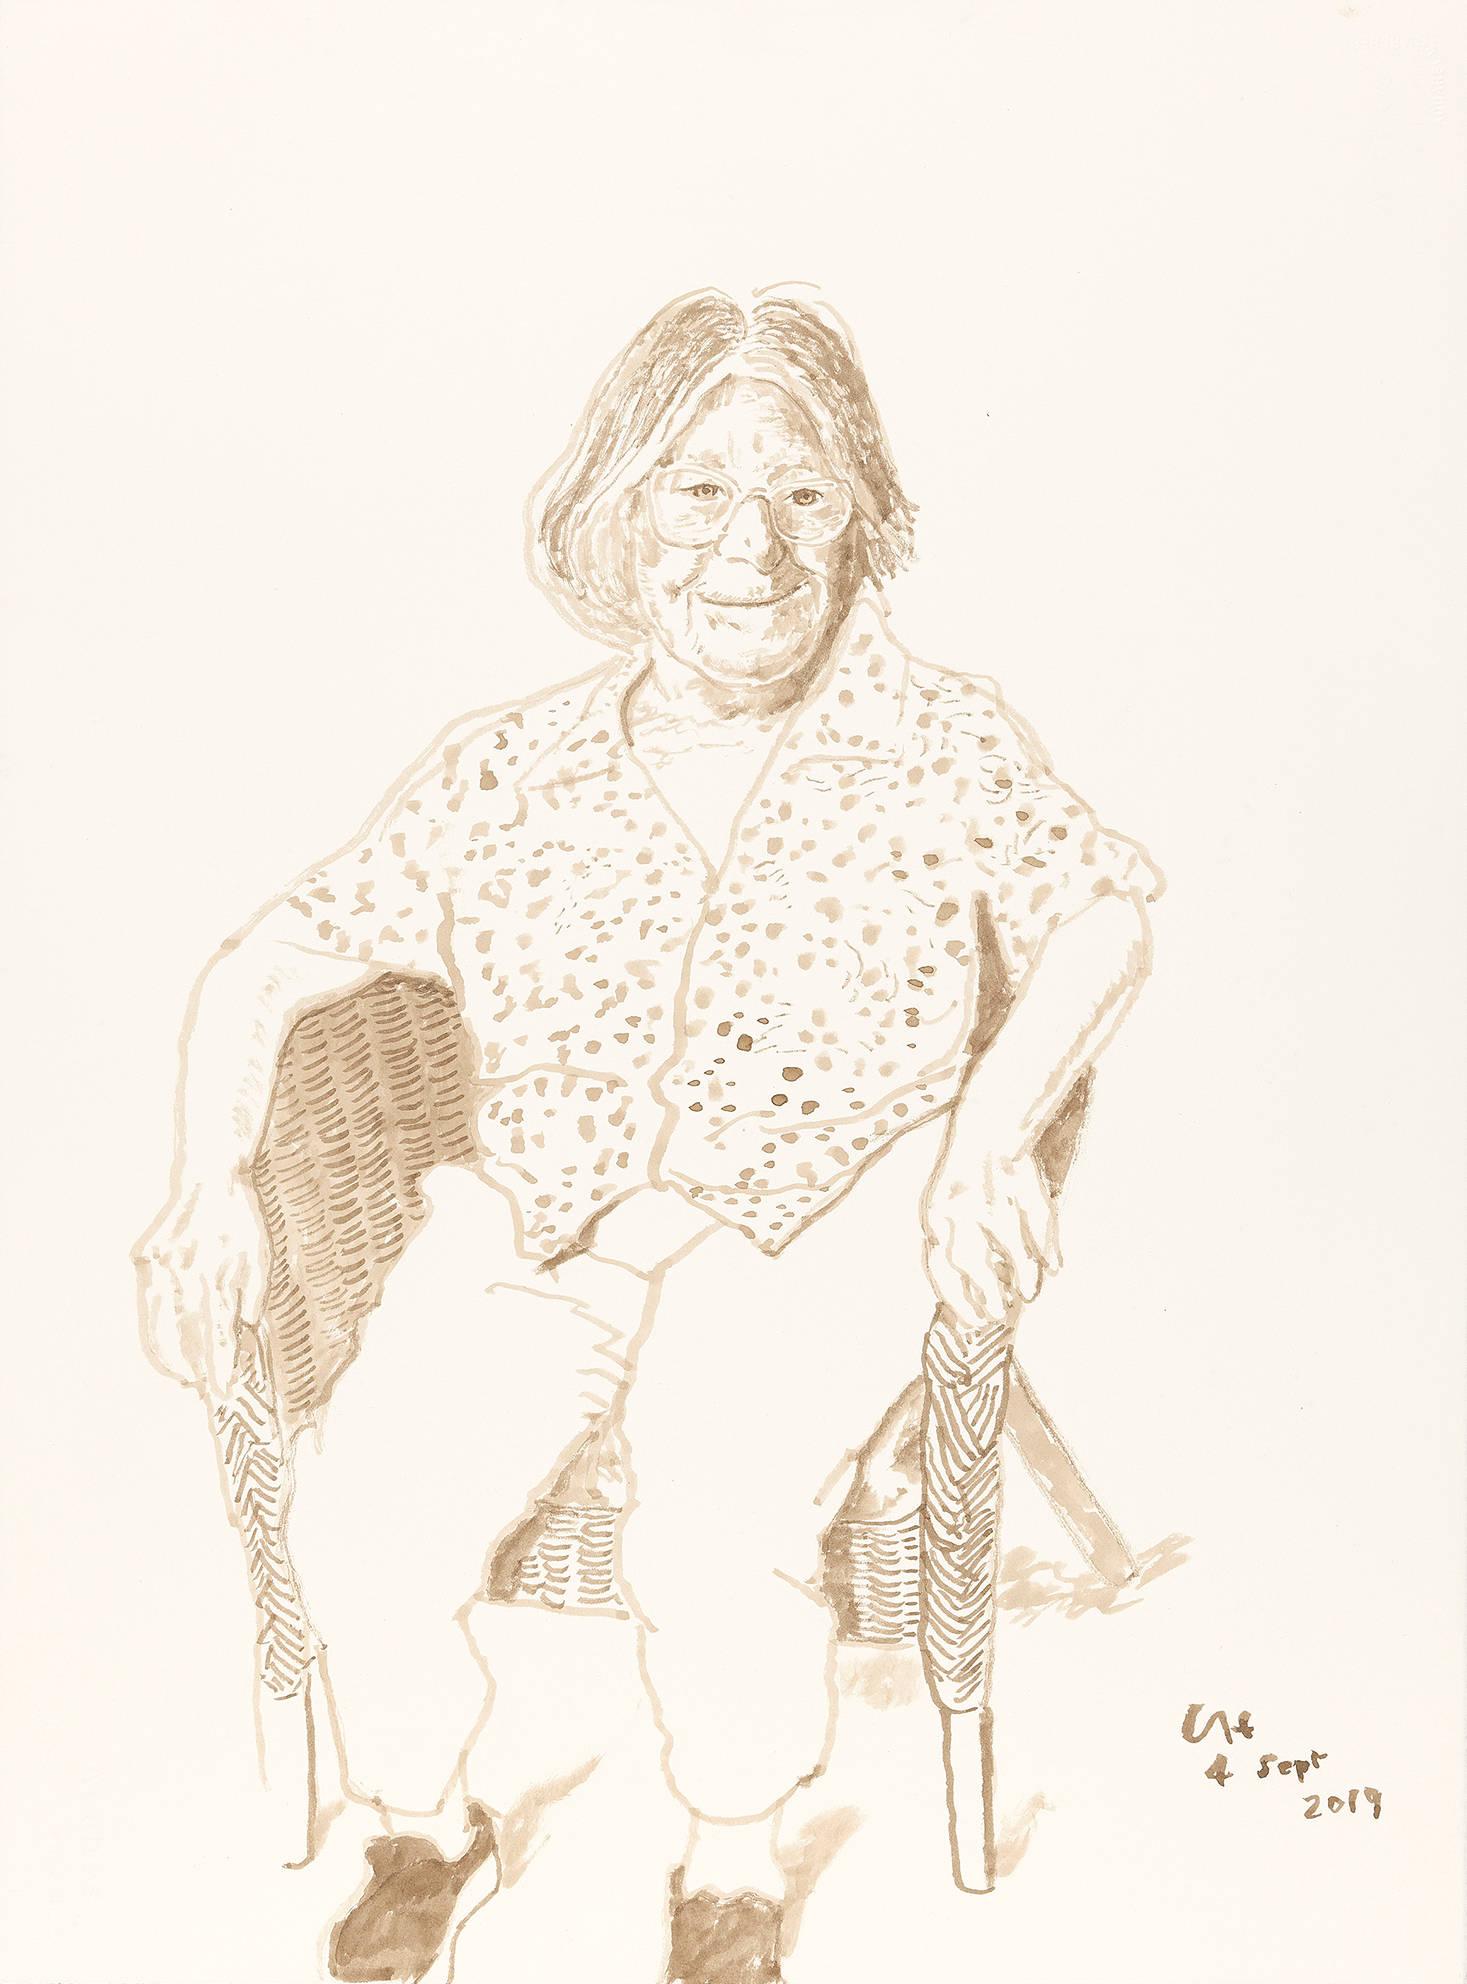 Margaret Hockney, 4 Sept 2019